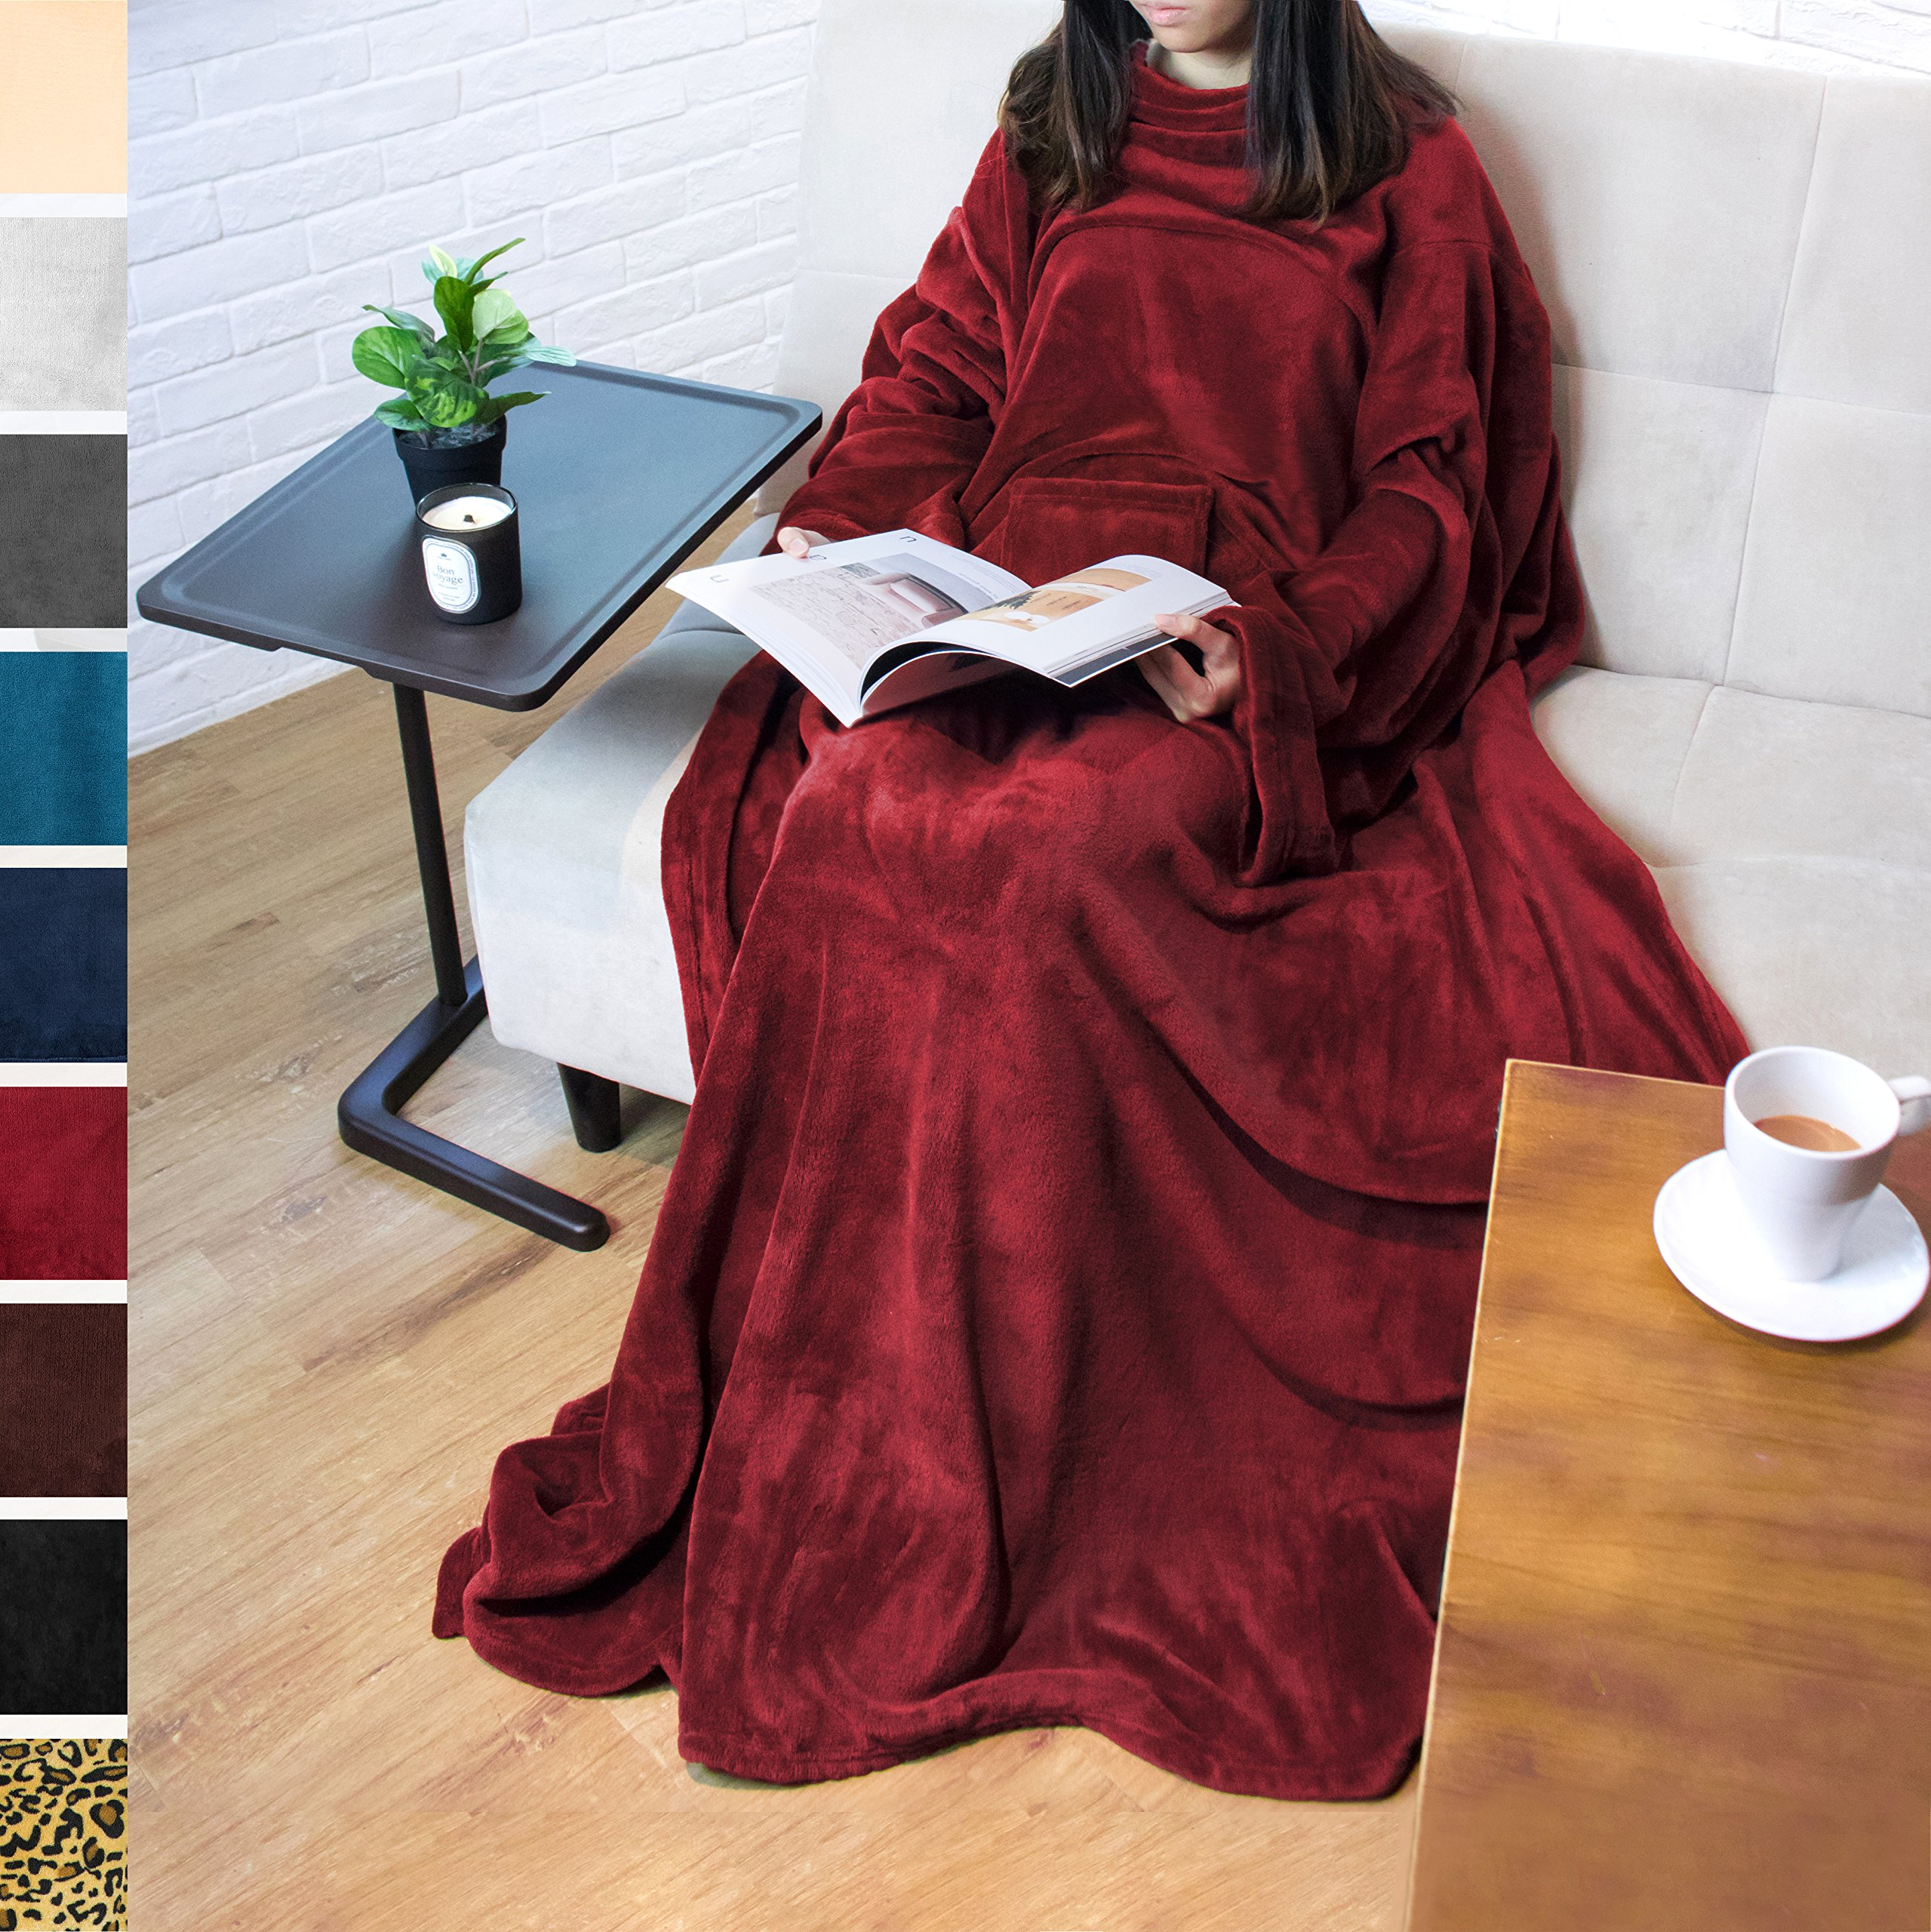 PAVILIA Premium Fleece Blanket with Sleeves for Adult, Women, Men | Warm, Cozy, Extra Soft, Microplush, Functional, Lightweight Wearable Throw (Wine, Regular Pocket)